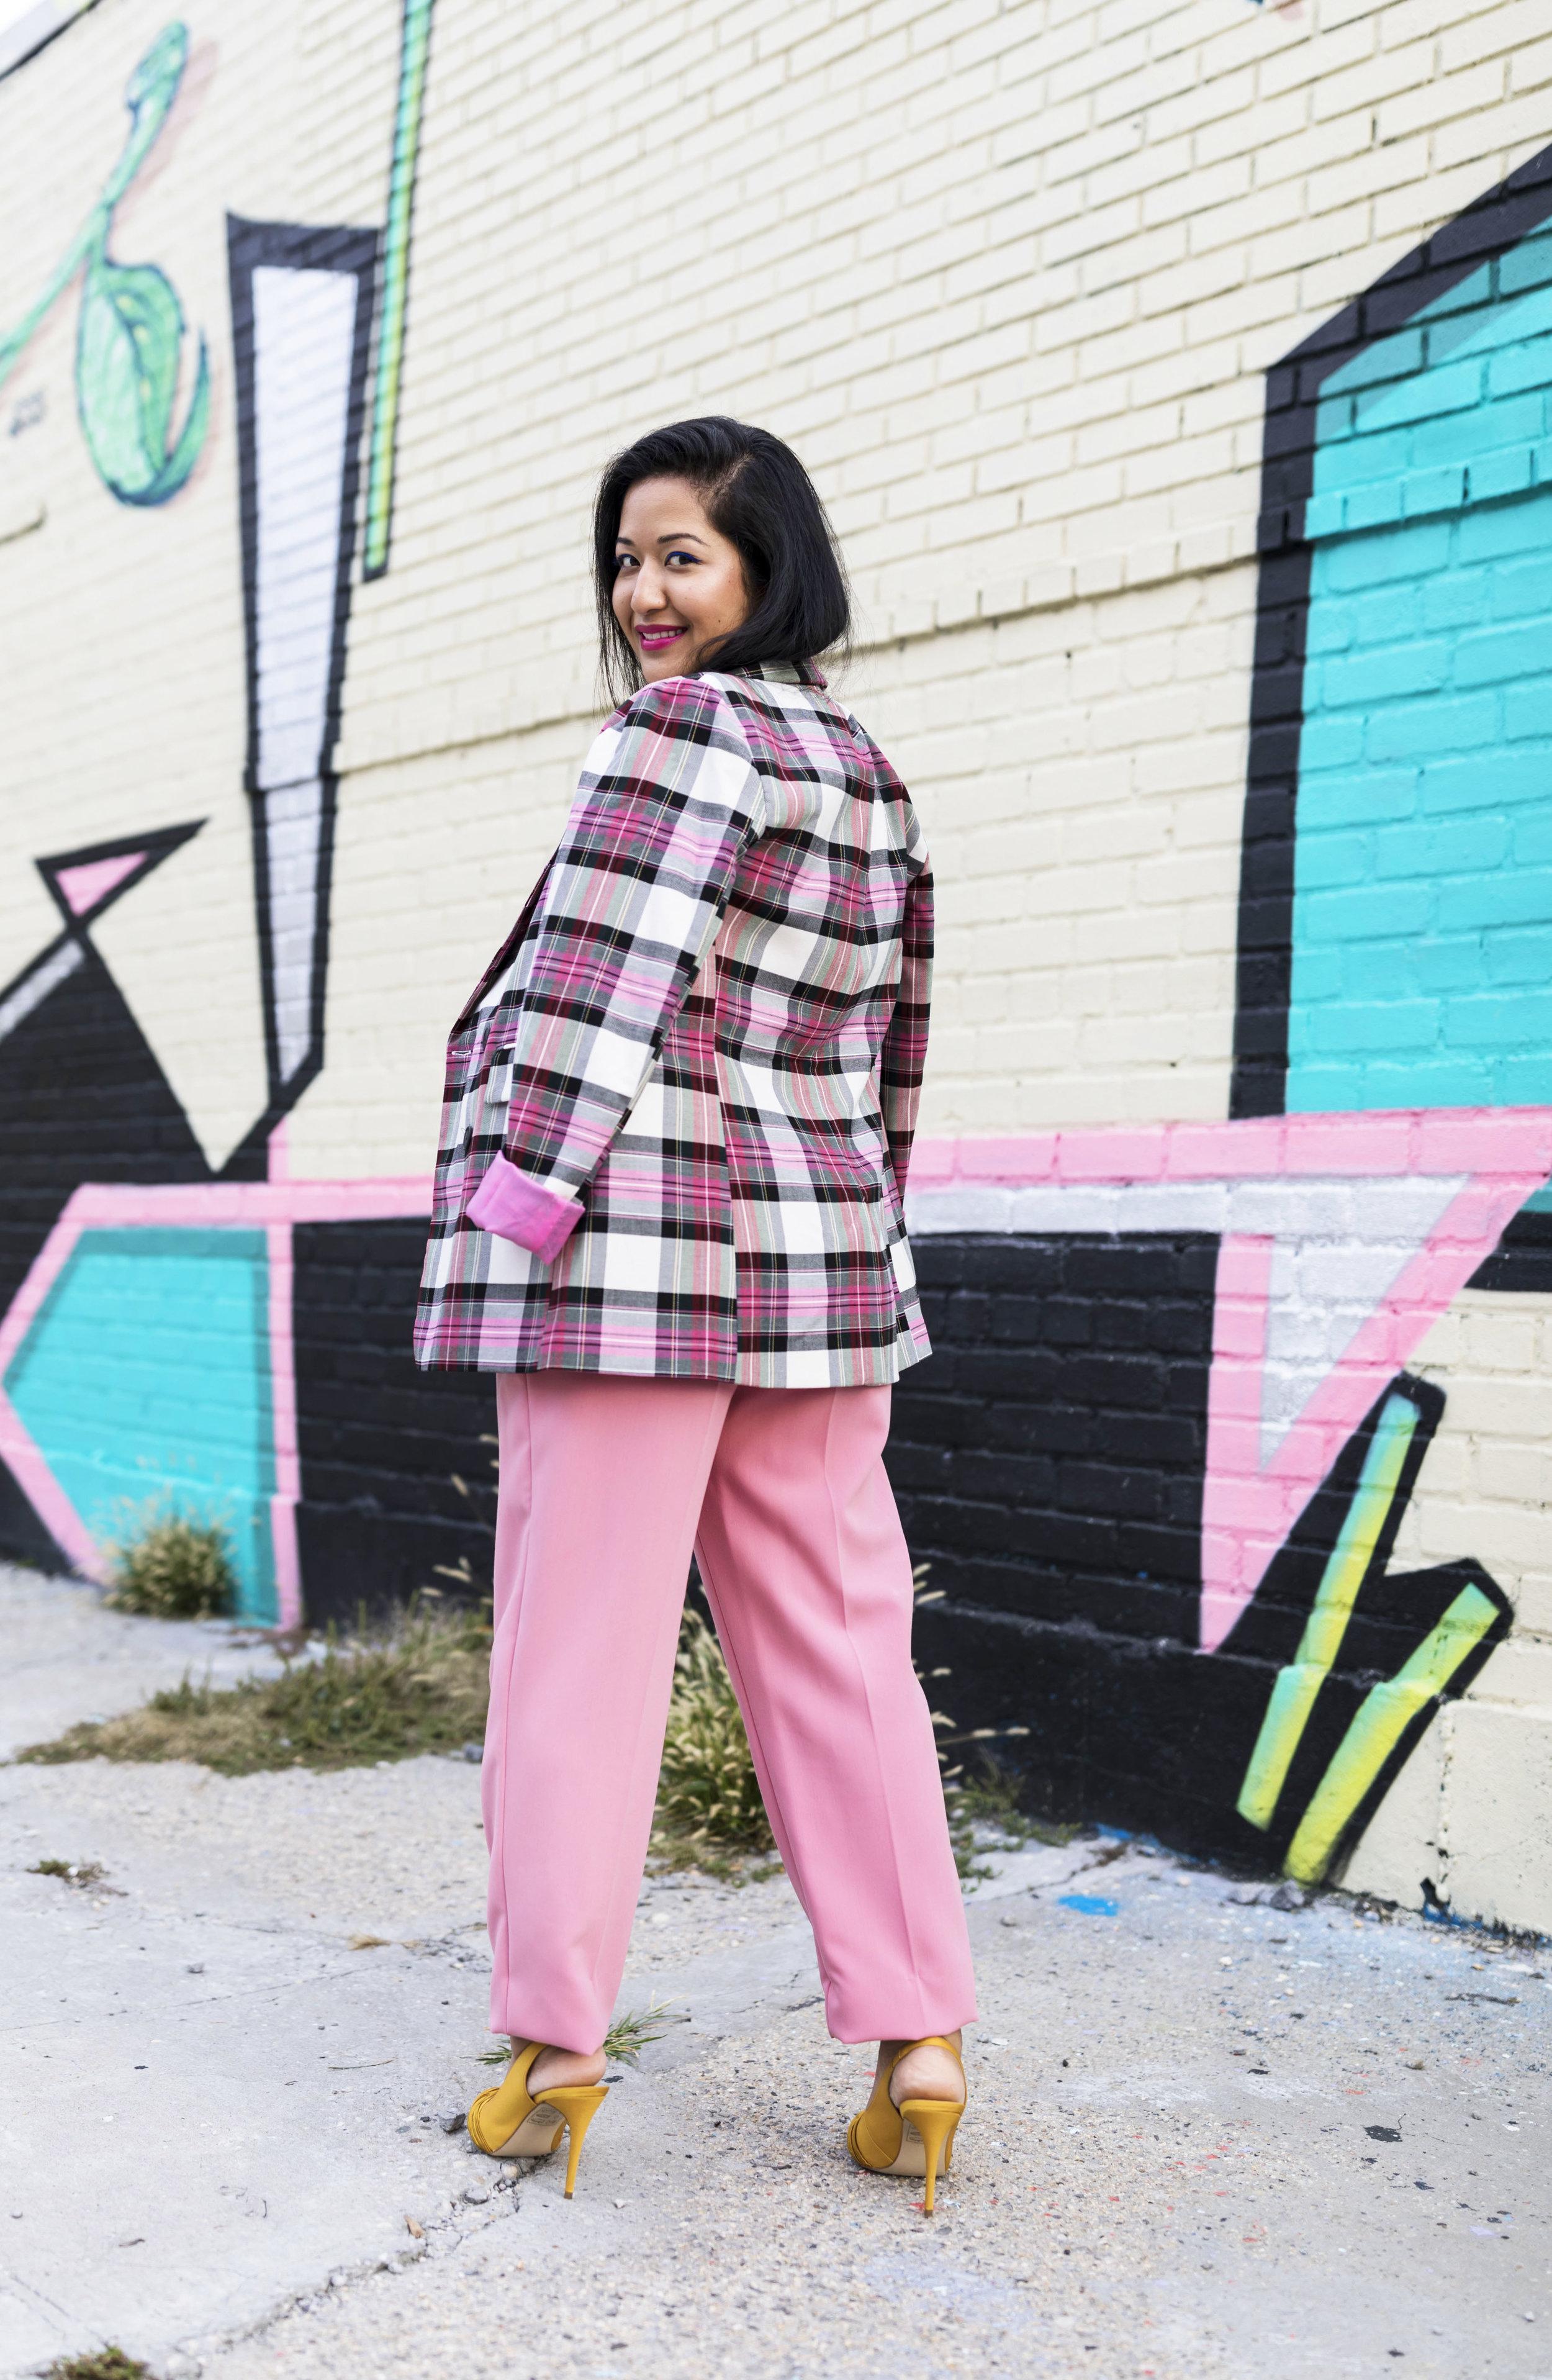 Krity S x Plaid Pink Suit5.jpg